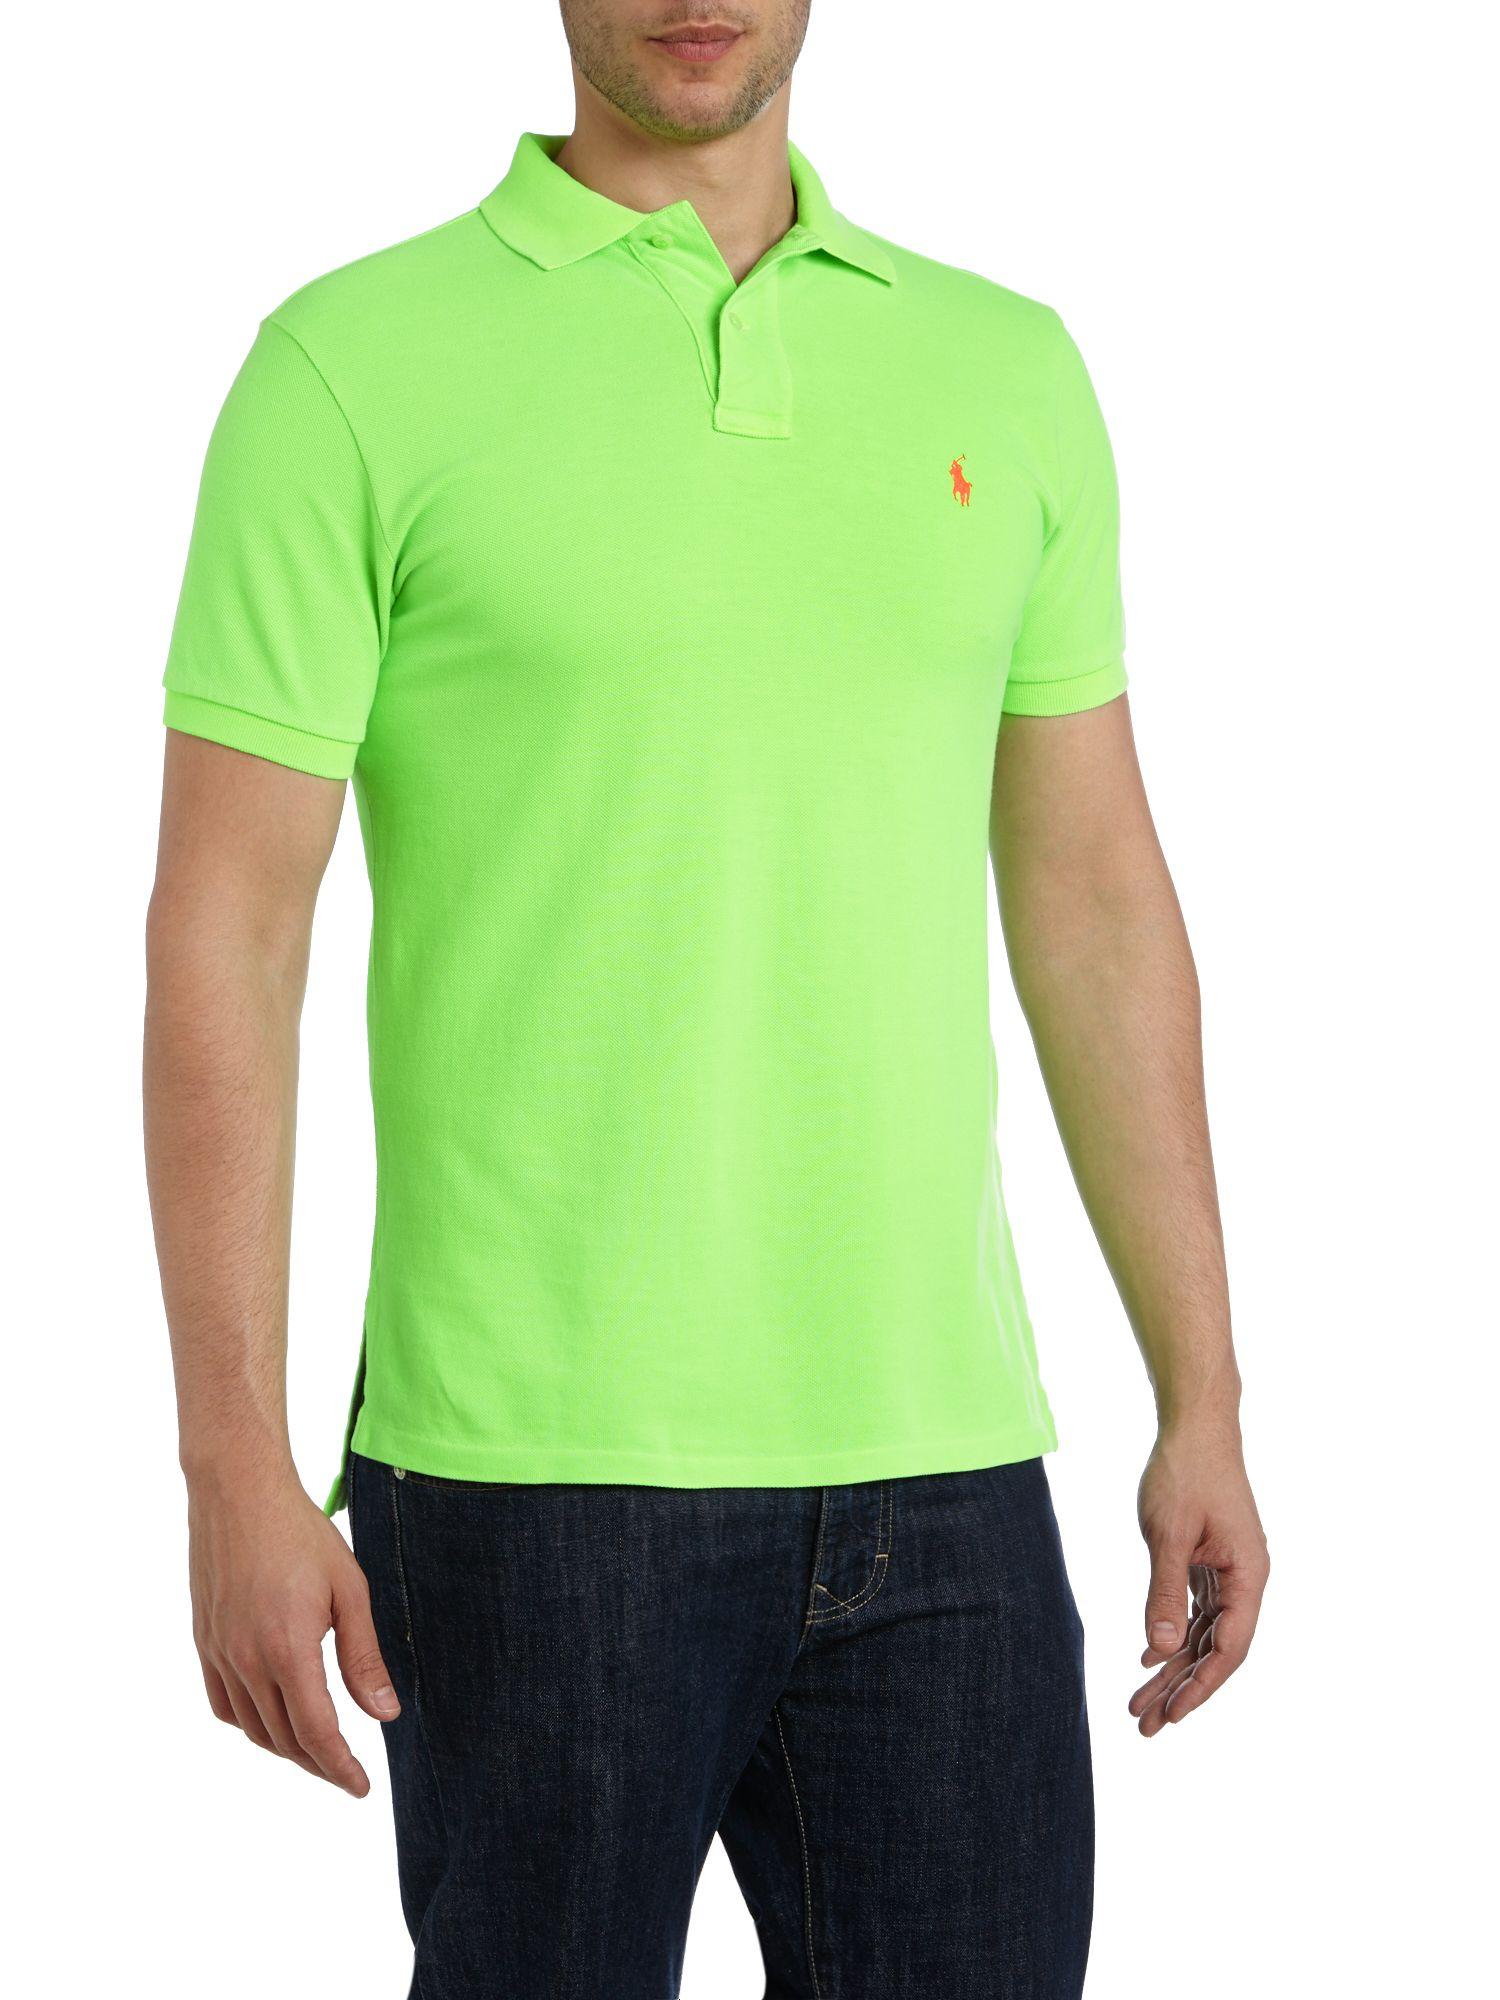 Polo Ralph Lauren Neon Polo Shirt In Green For Men Lyst